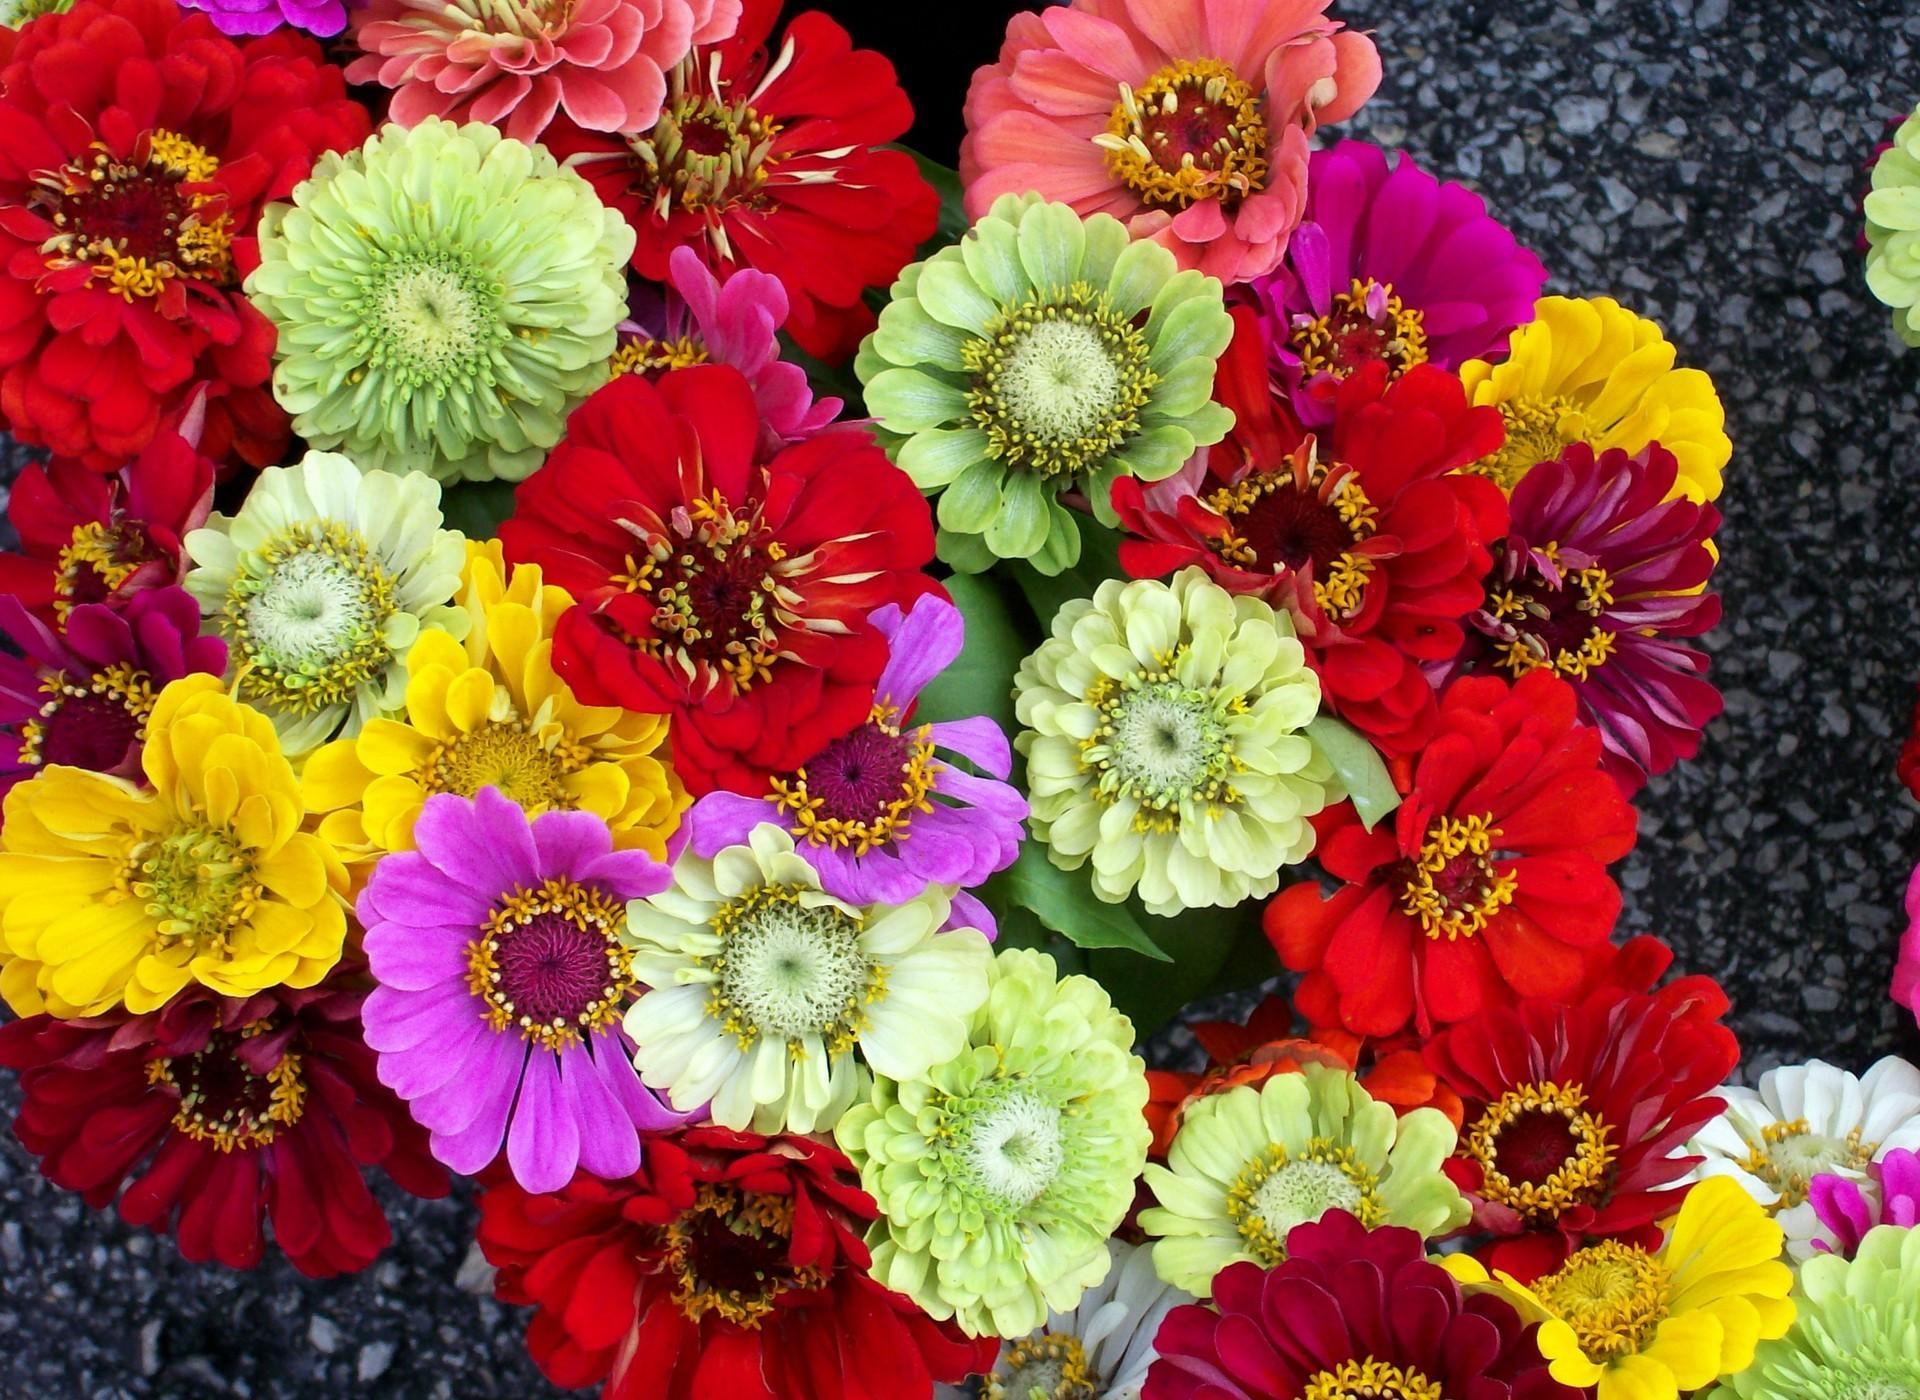 Wallpaper : colorful, flowers, bright, flora, petal, different, land ...